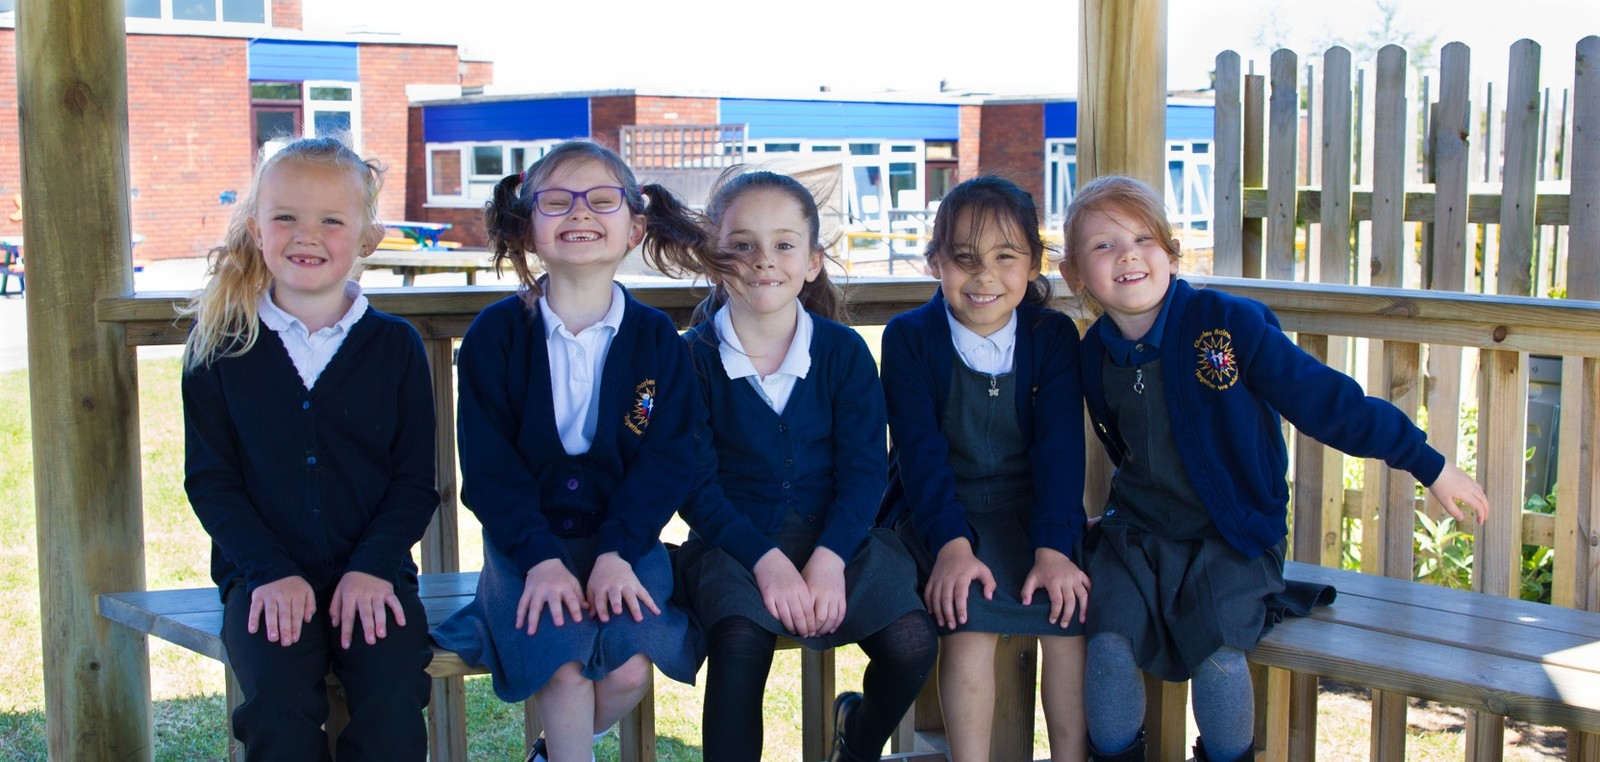 the gainsborough charles baines community primary school